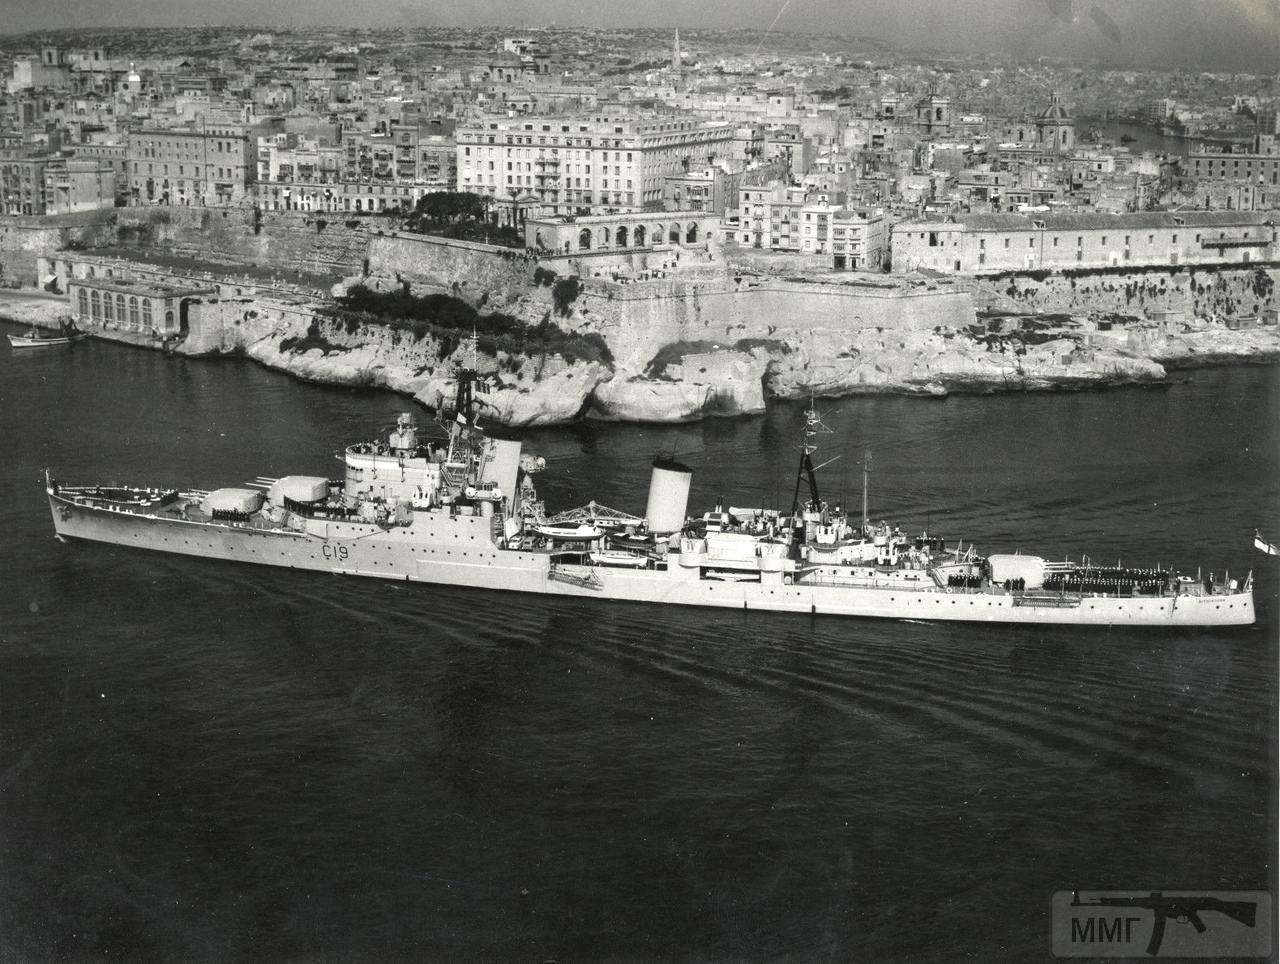 47728 - HMS Birmingham